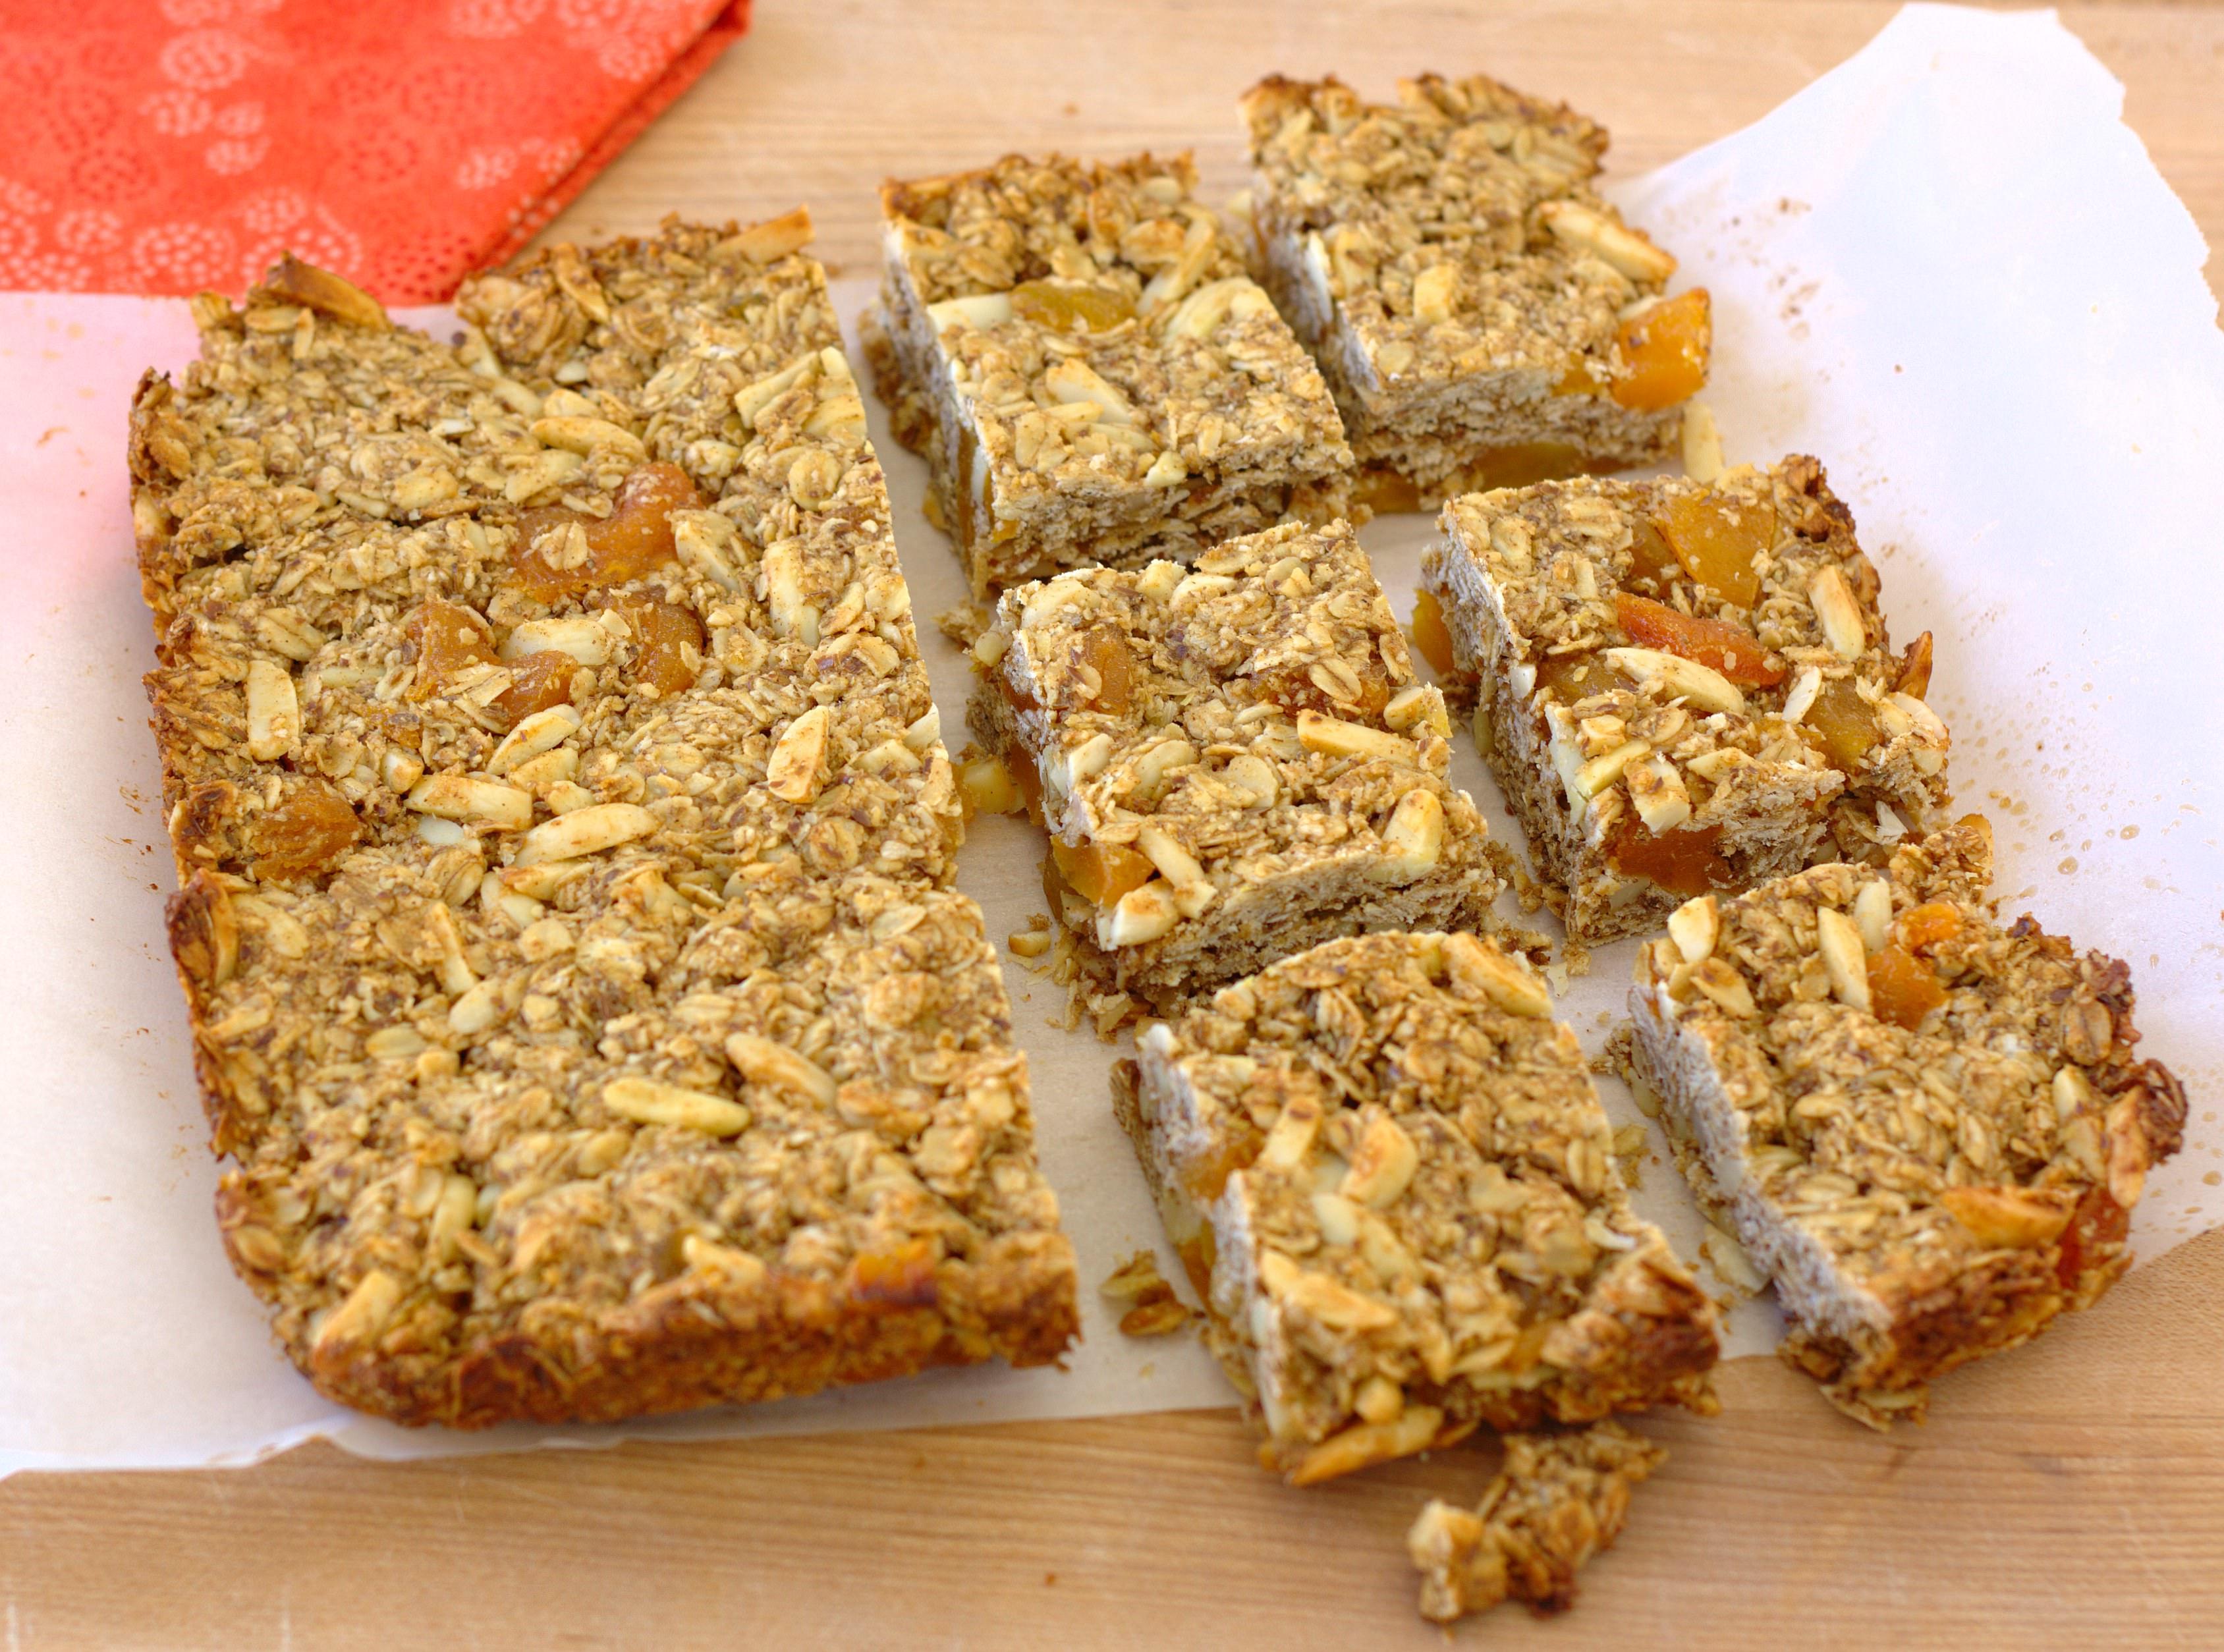 Whole Foods Homemade Granola Bars Recipe